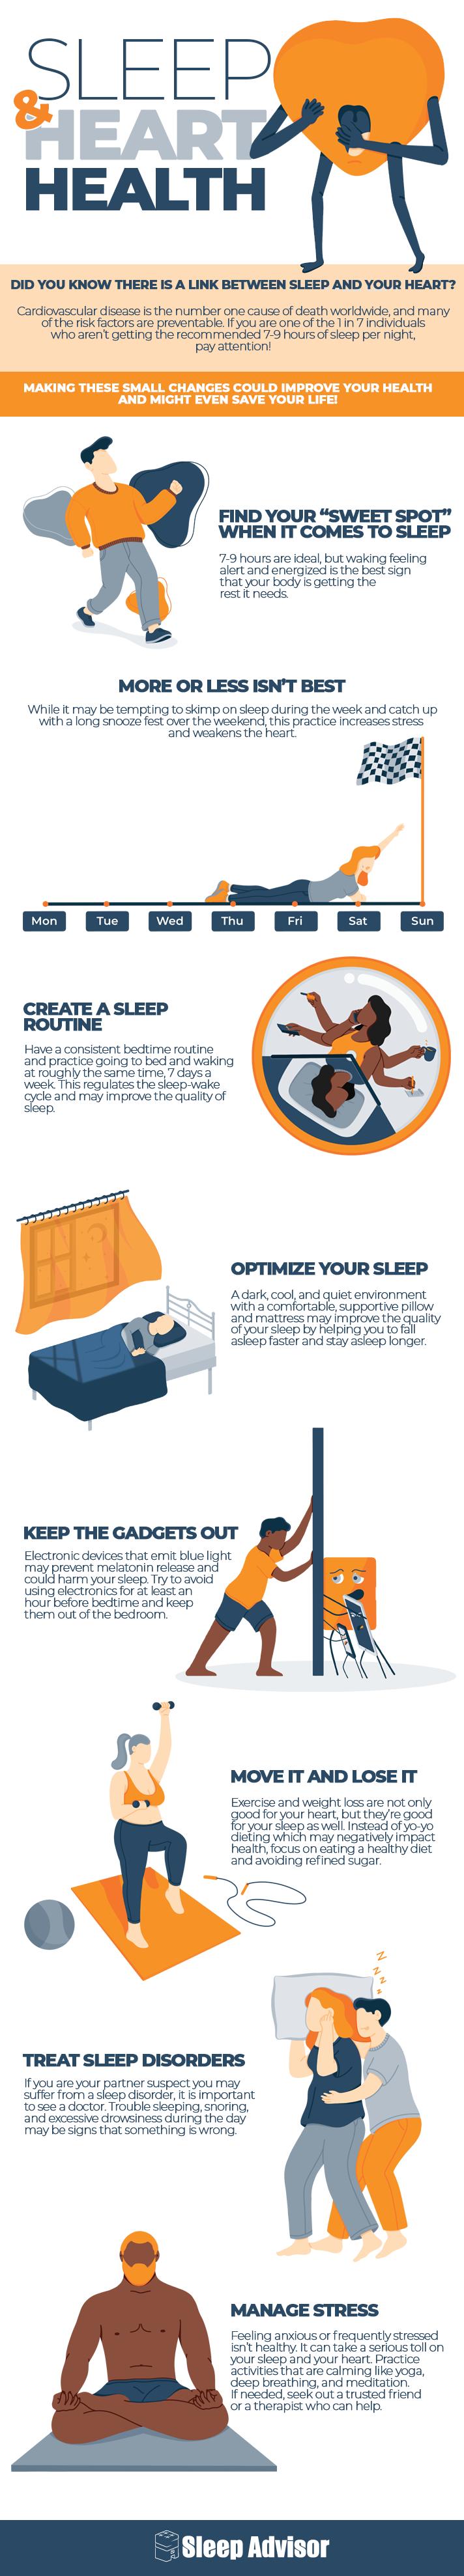 Sleep and Heart Health Infographic